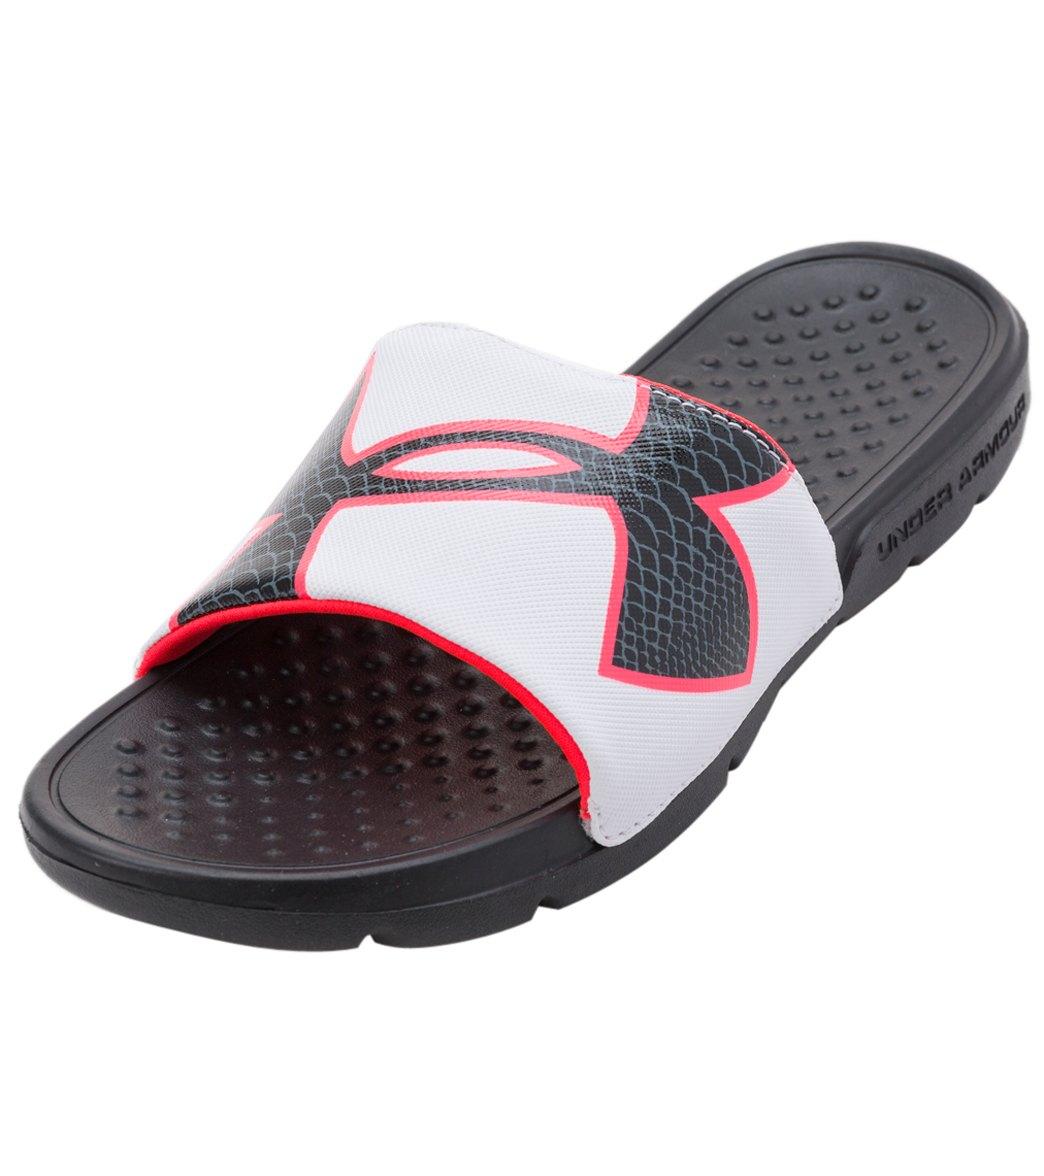 f74ae30e96 Under Armour Women's Strike Rock Slide Sandals